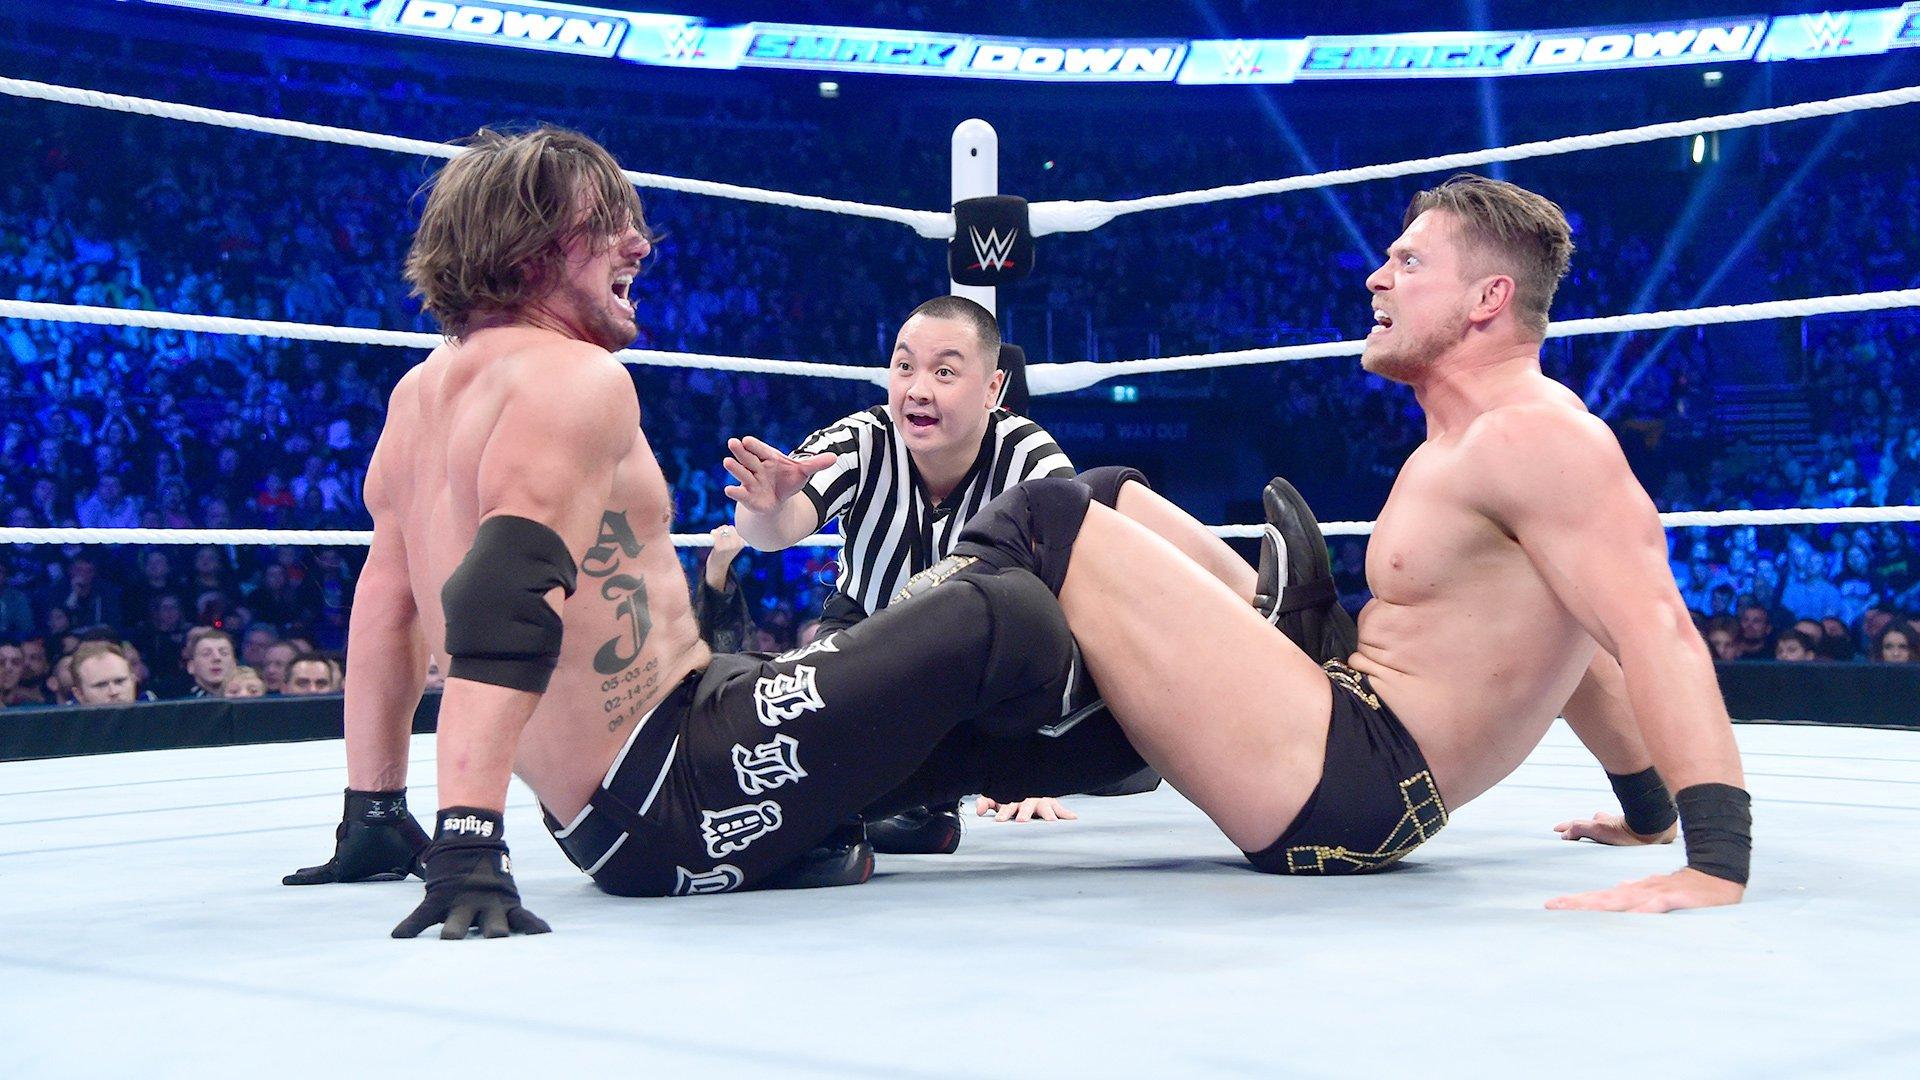 Wrestling news: The Miz wants AJ Styles' WWE Championship